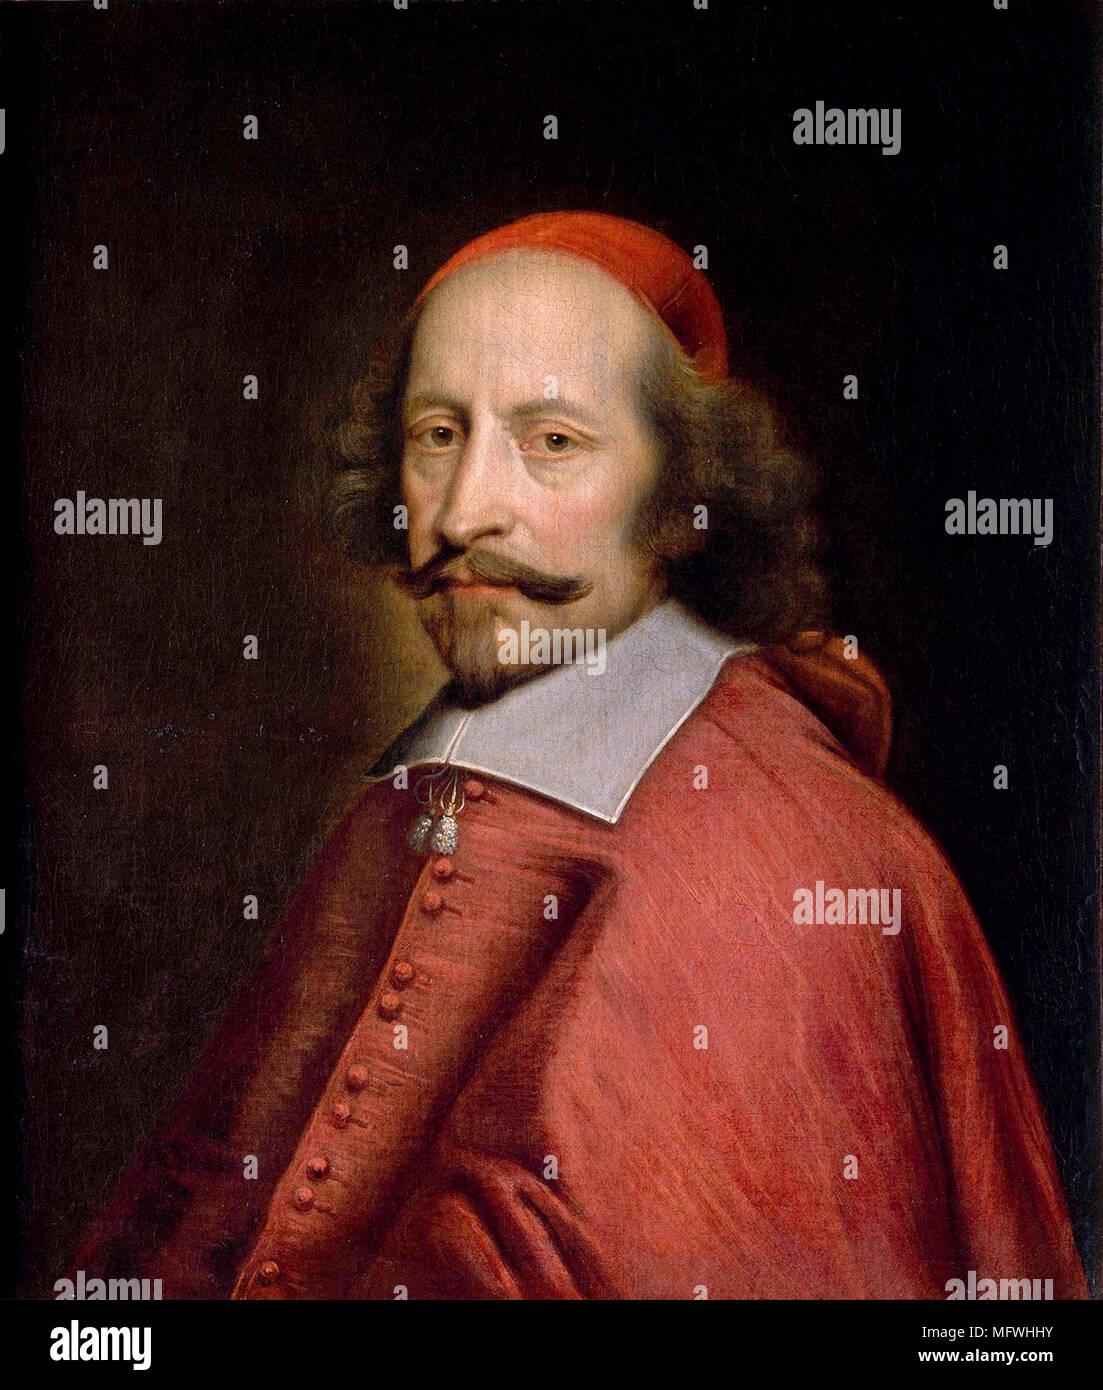 Cardinal Jules Raymond Mazarin, 1st Duke of Rethel, Mayenne and Nevers (1602 – 1661),born Giulio Raimondo Mazzarino, Italian cardinal, diplomat, and politician Portrait of Jules Mazarin by Pierre Mignard (1658) - Stock Image